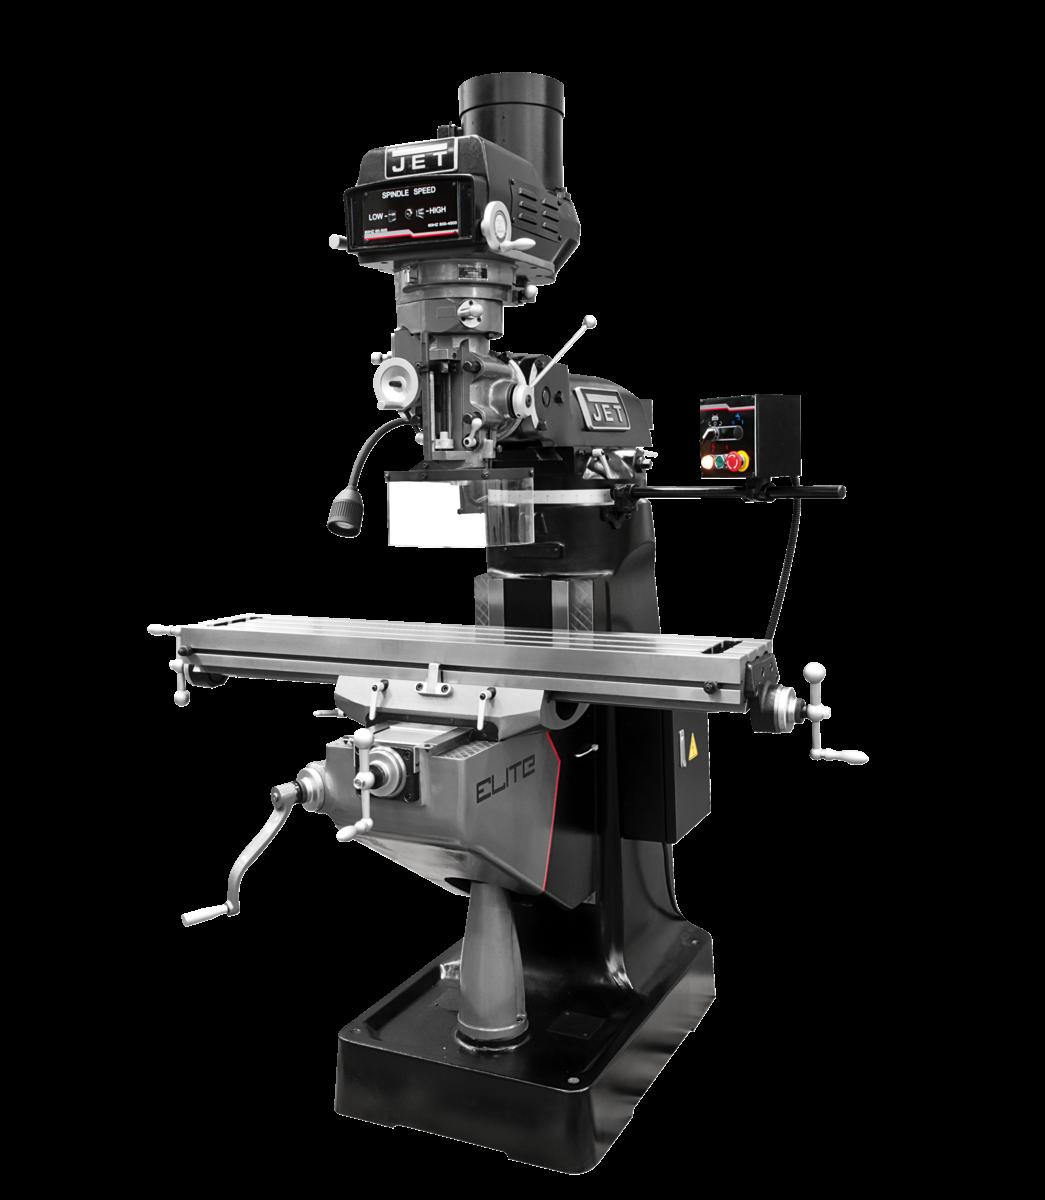 ETM-949, Elite 9x49 Variable Speed Mill